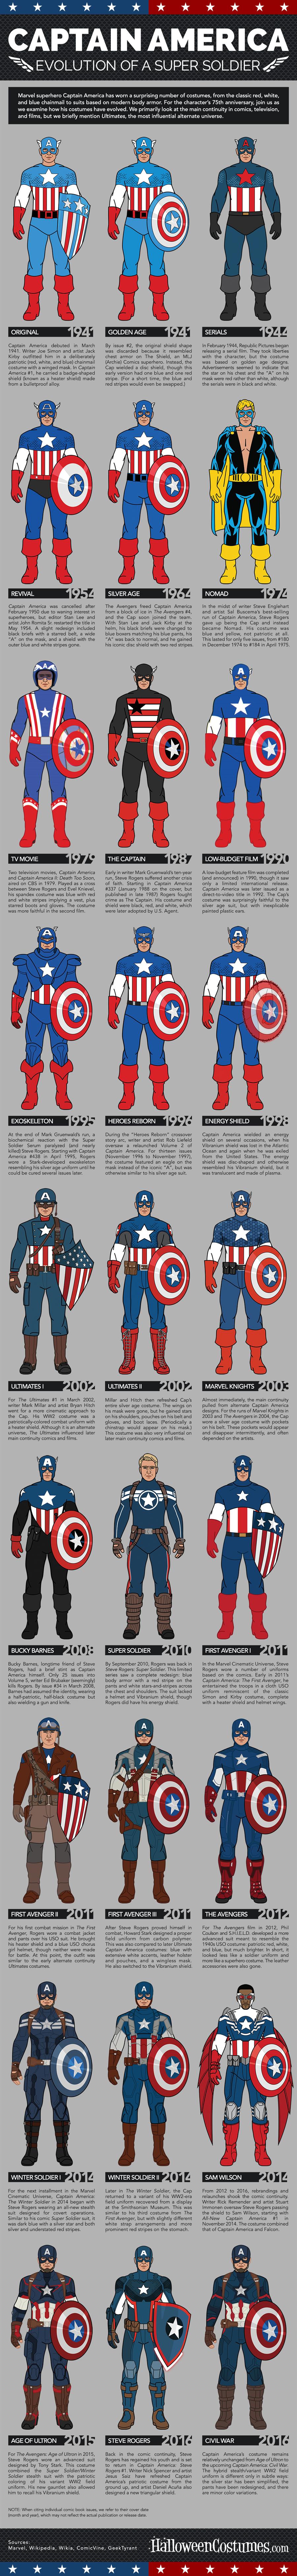 Captain America Costumes: Evolution of a Super Soldier